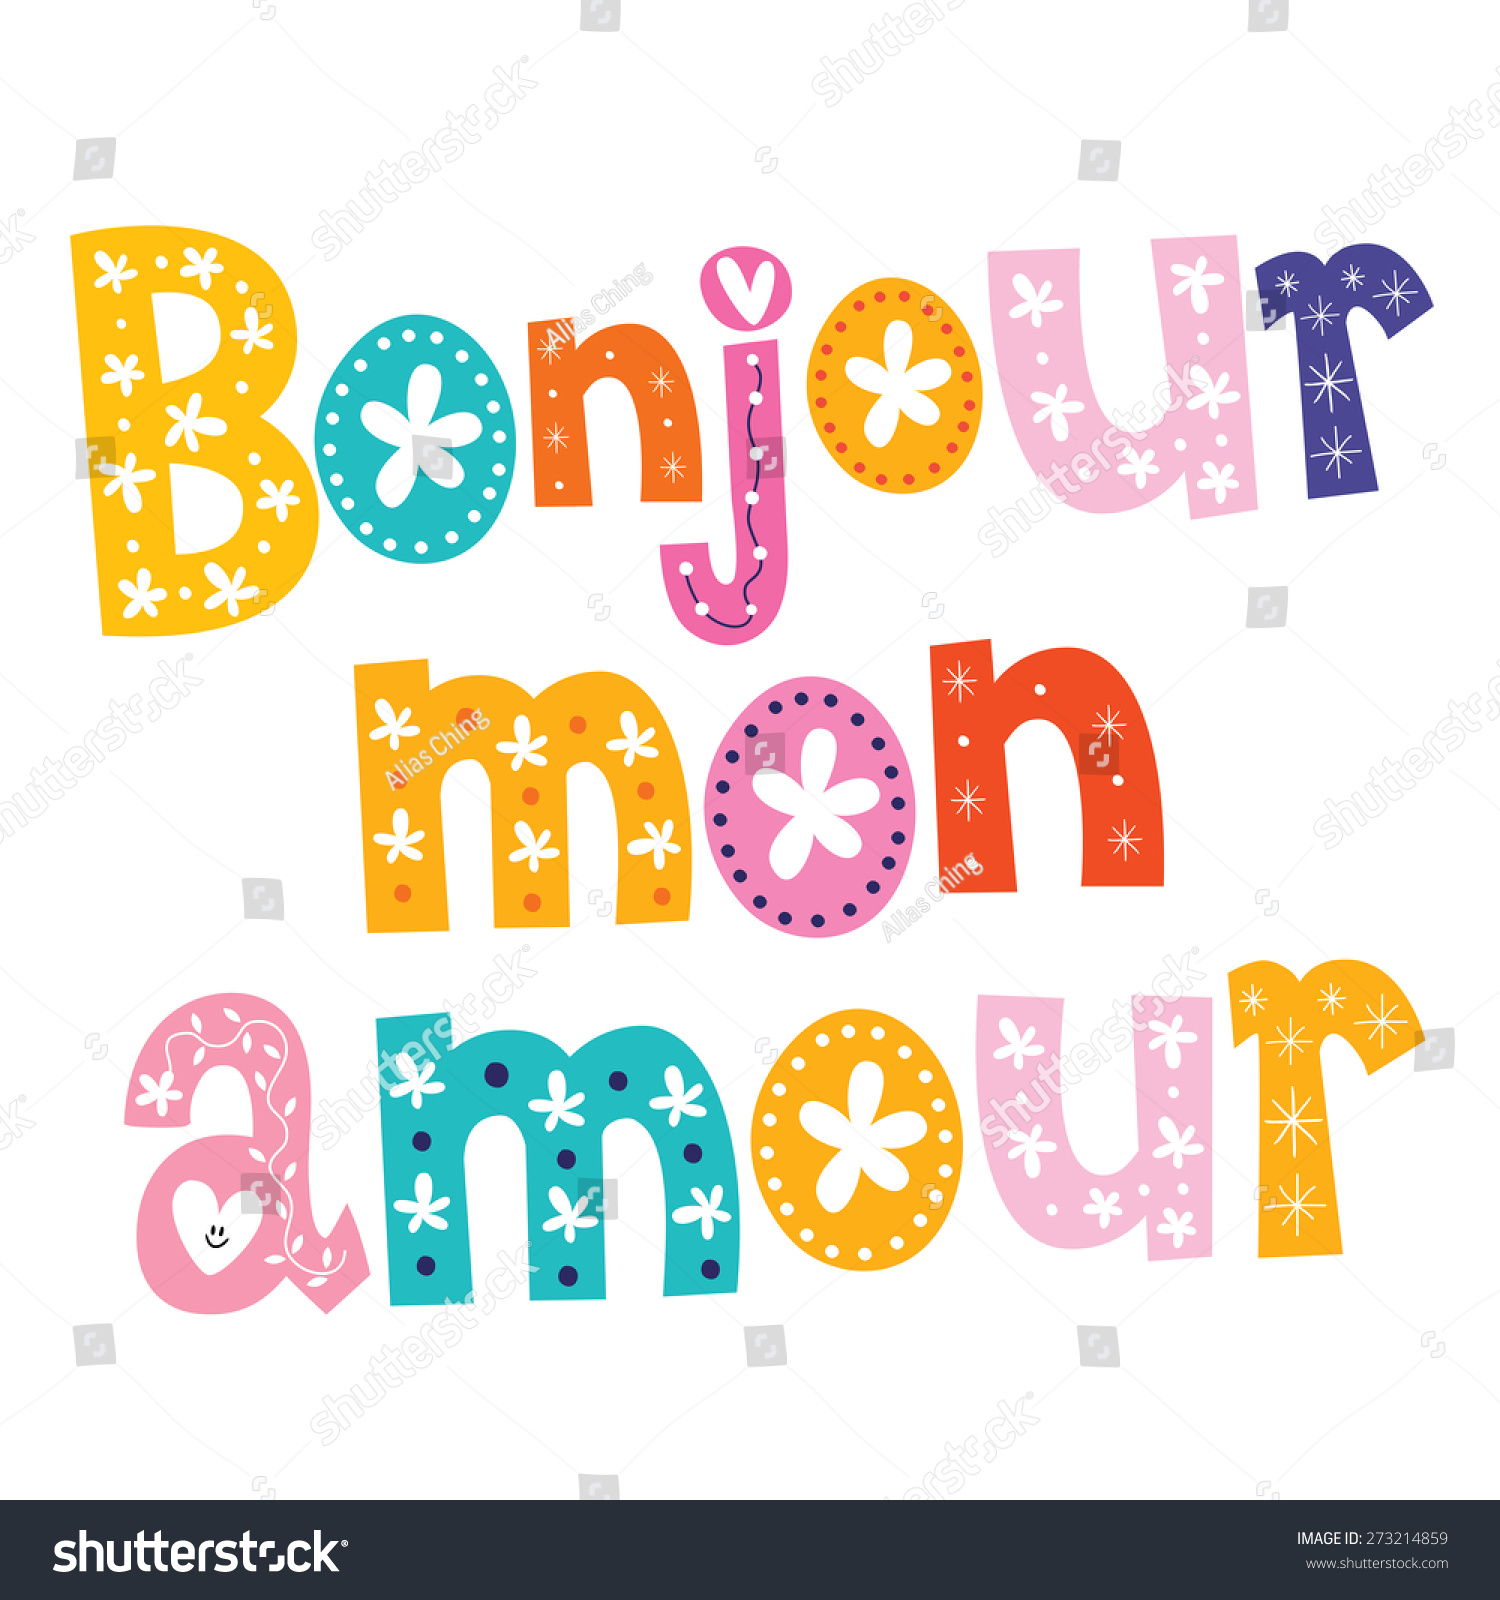 bonjour mon amour stock vector 273214859 shutterstock. Black Bedroom Furniture Sets. Home Design Ideas